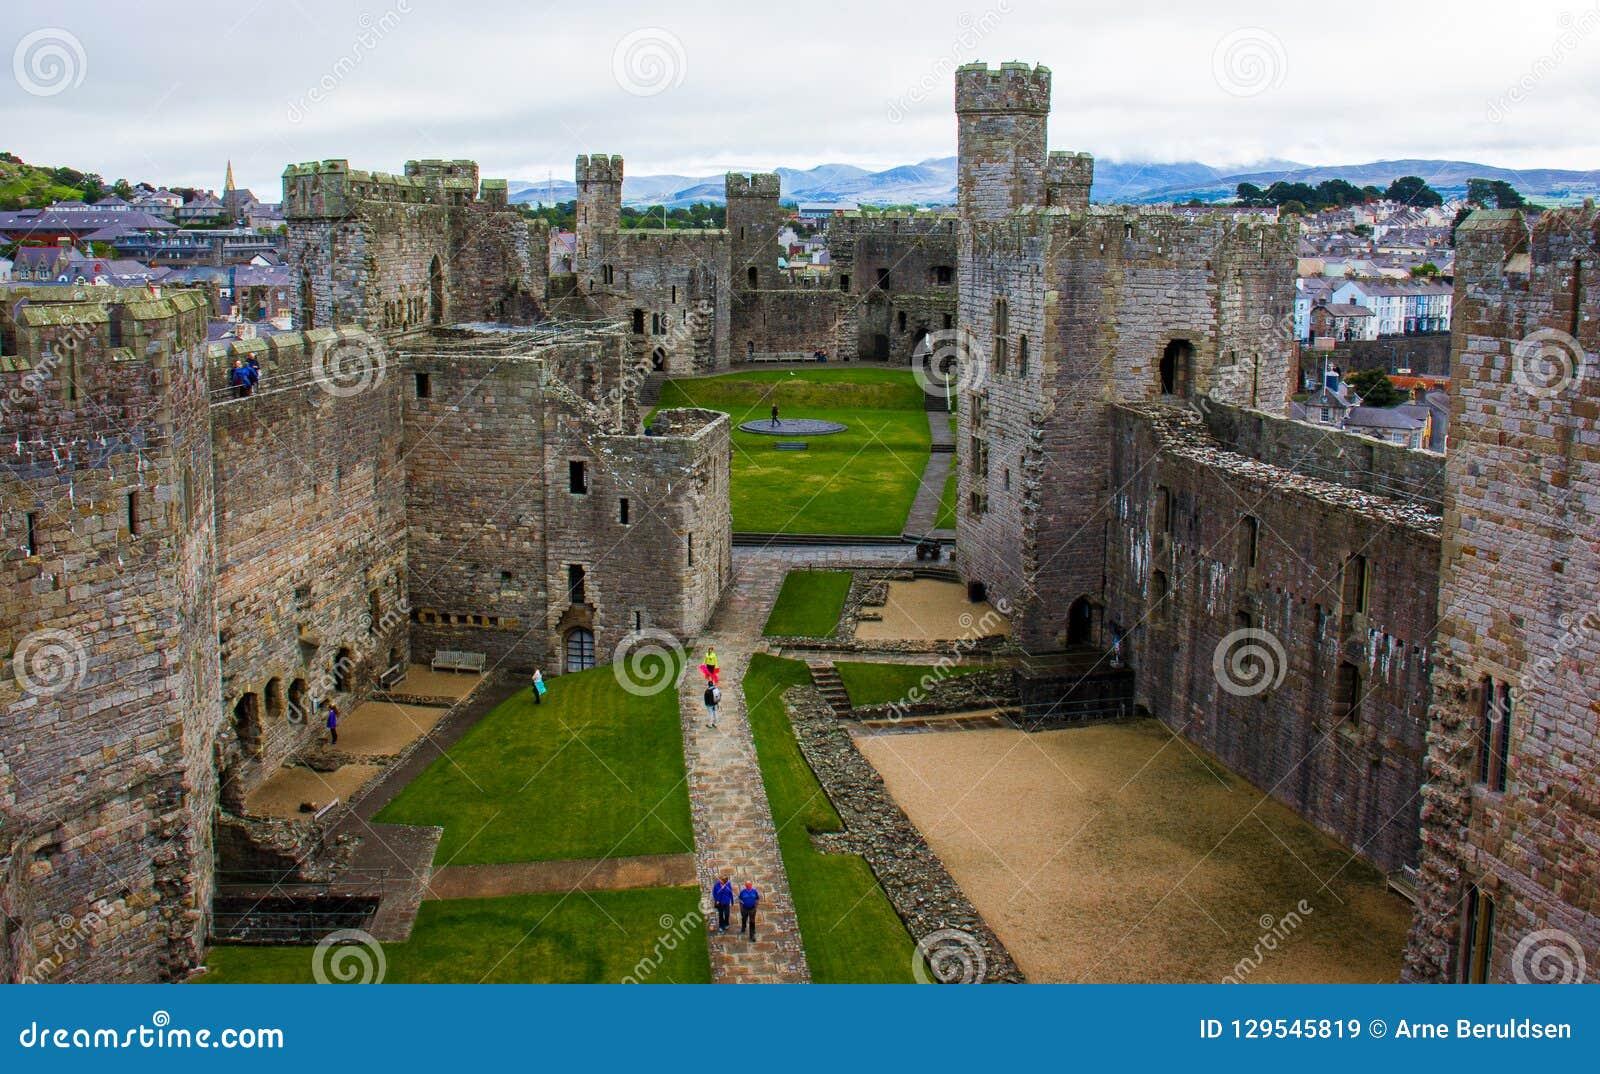 El interior del castillo de Caernarfon